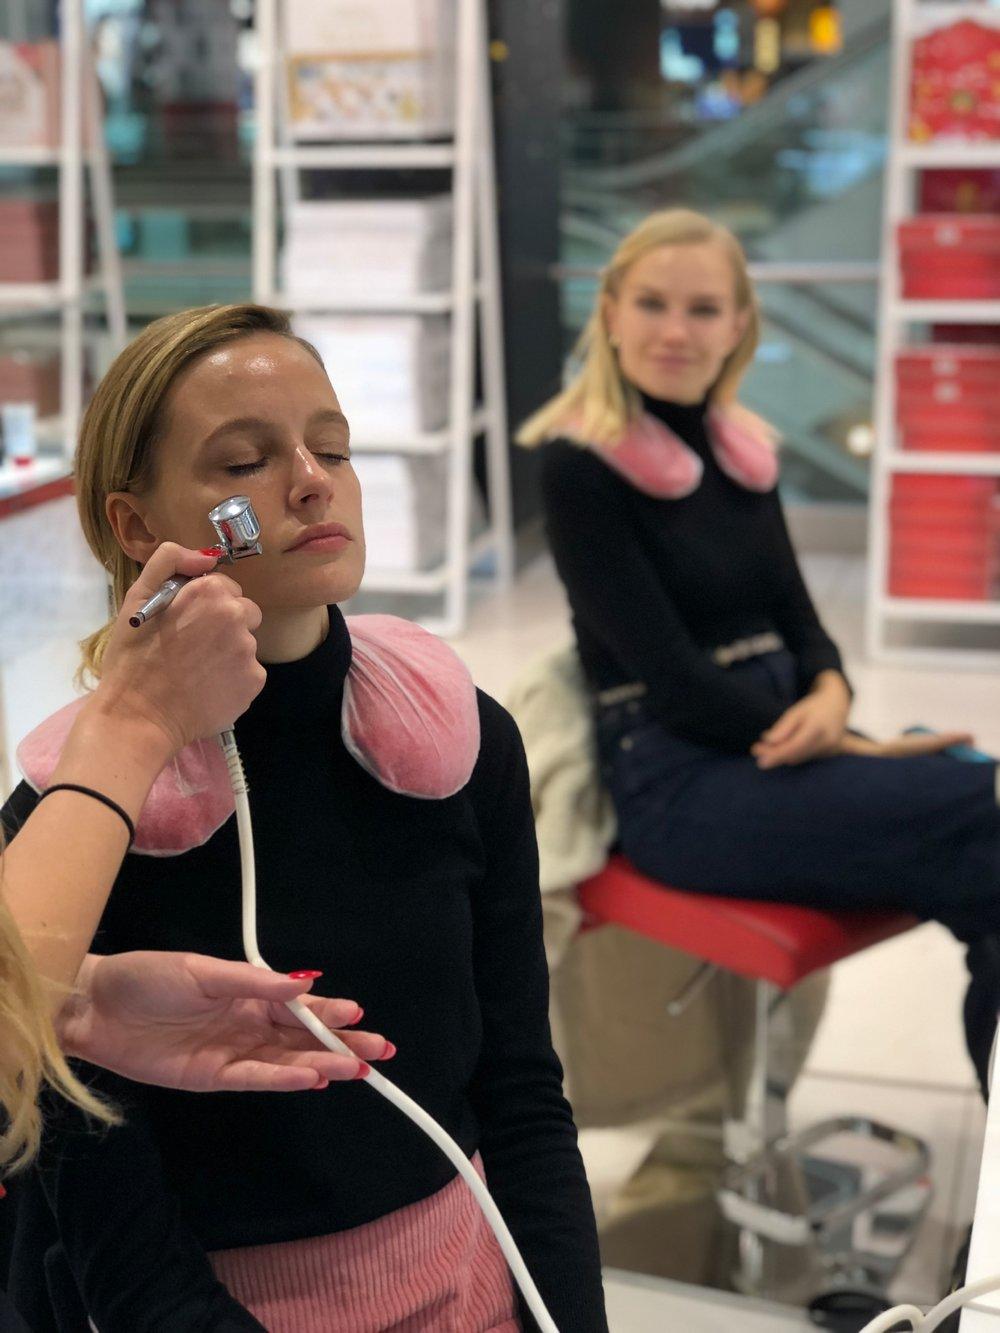 THE 4 OF US - Elizabeth Arden Oxygen facial treatment